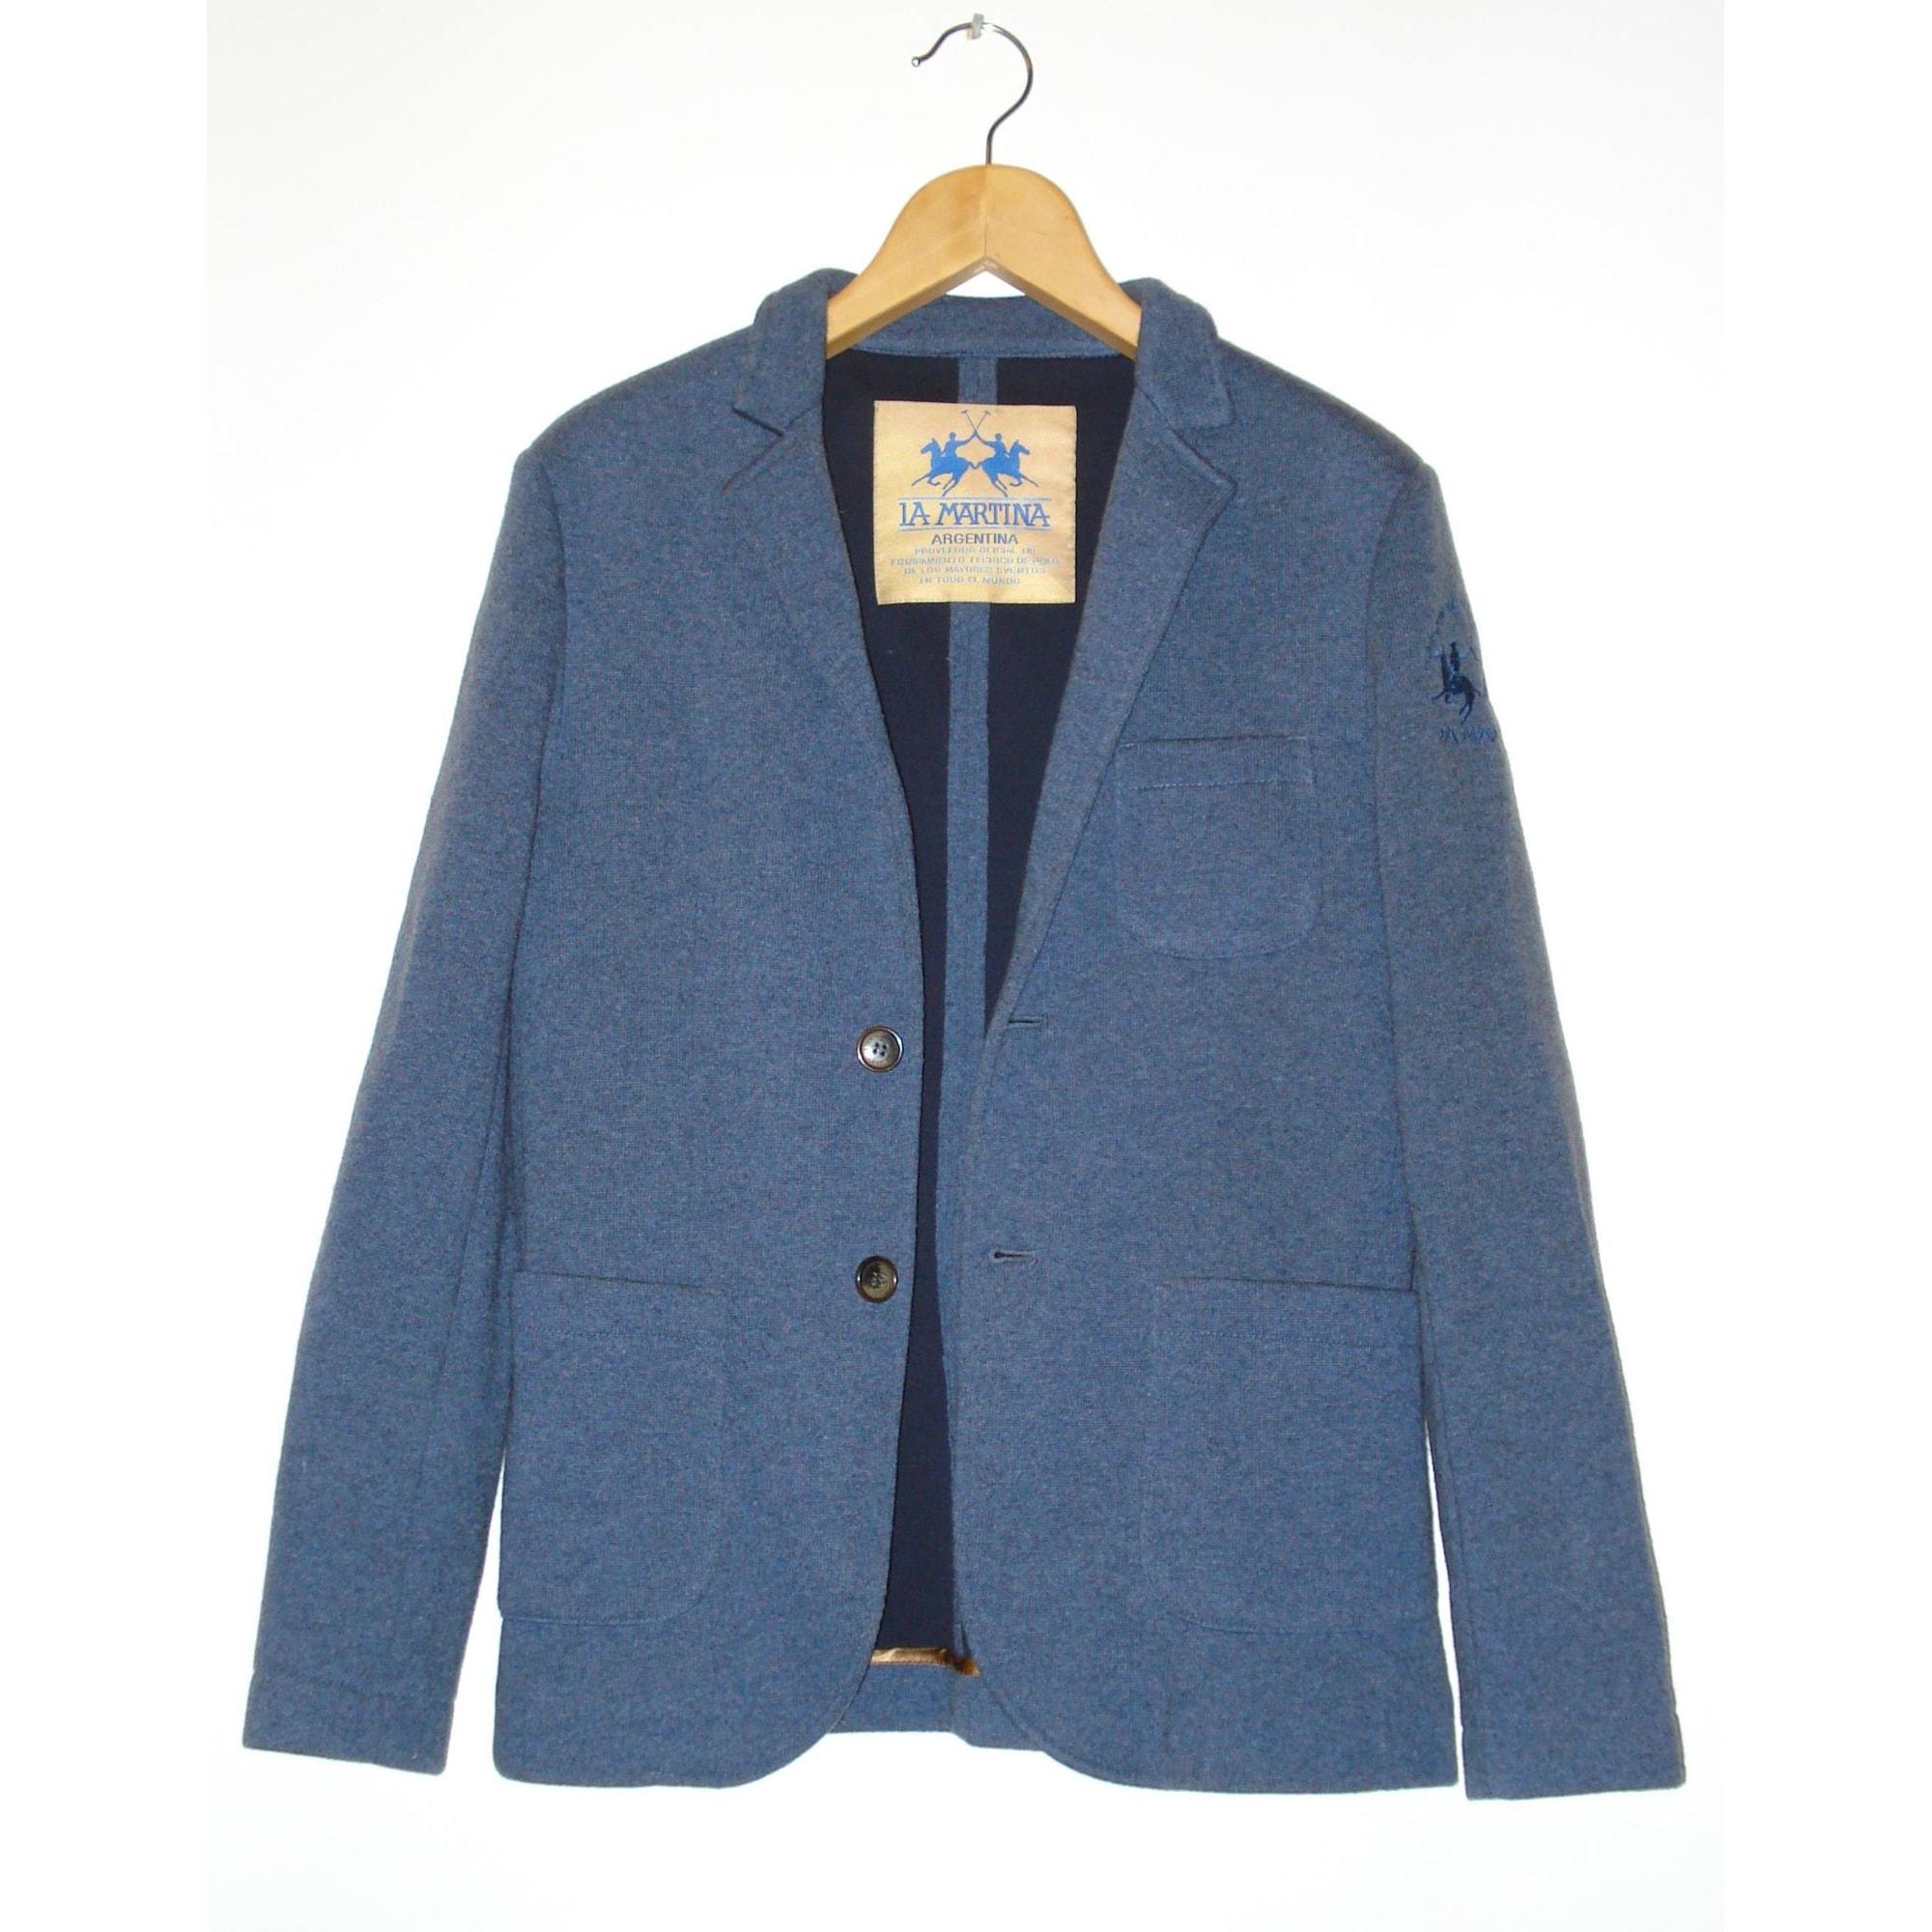 Veste LA MARTINA Bleu, bleu marine, bleu turquoise